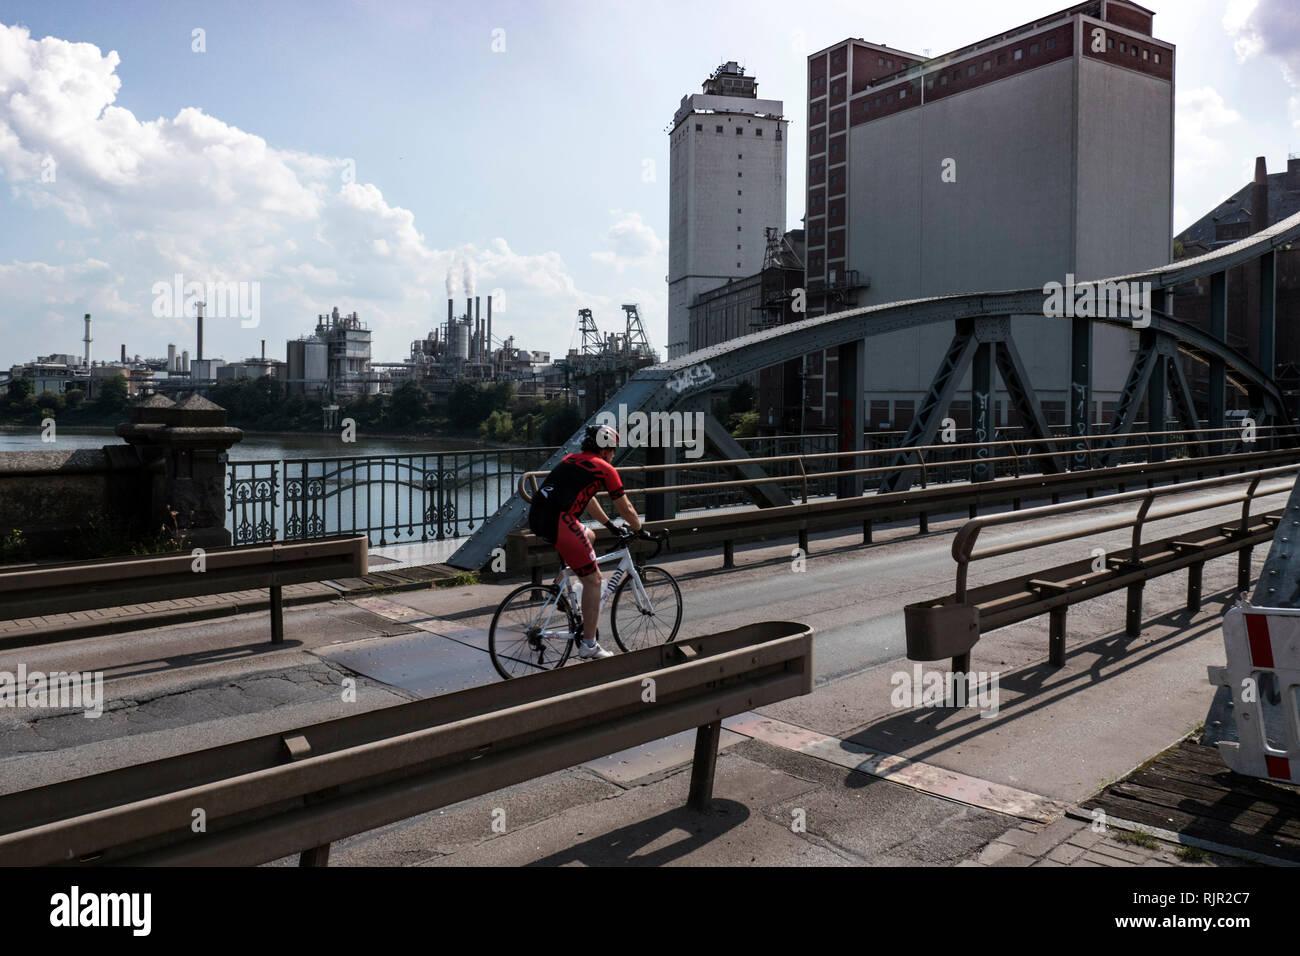 Historic steel bridge in the Krefelder Rheinhafen - Stock Image